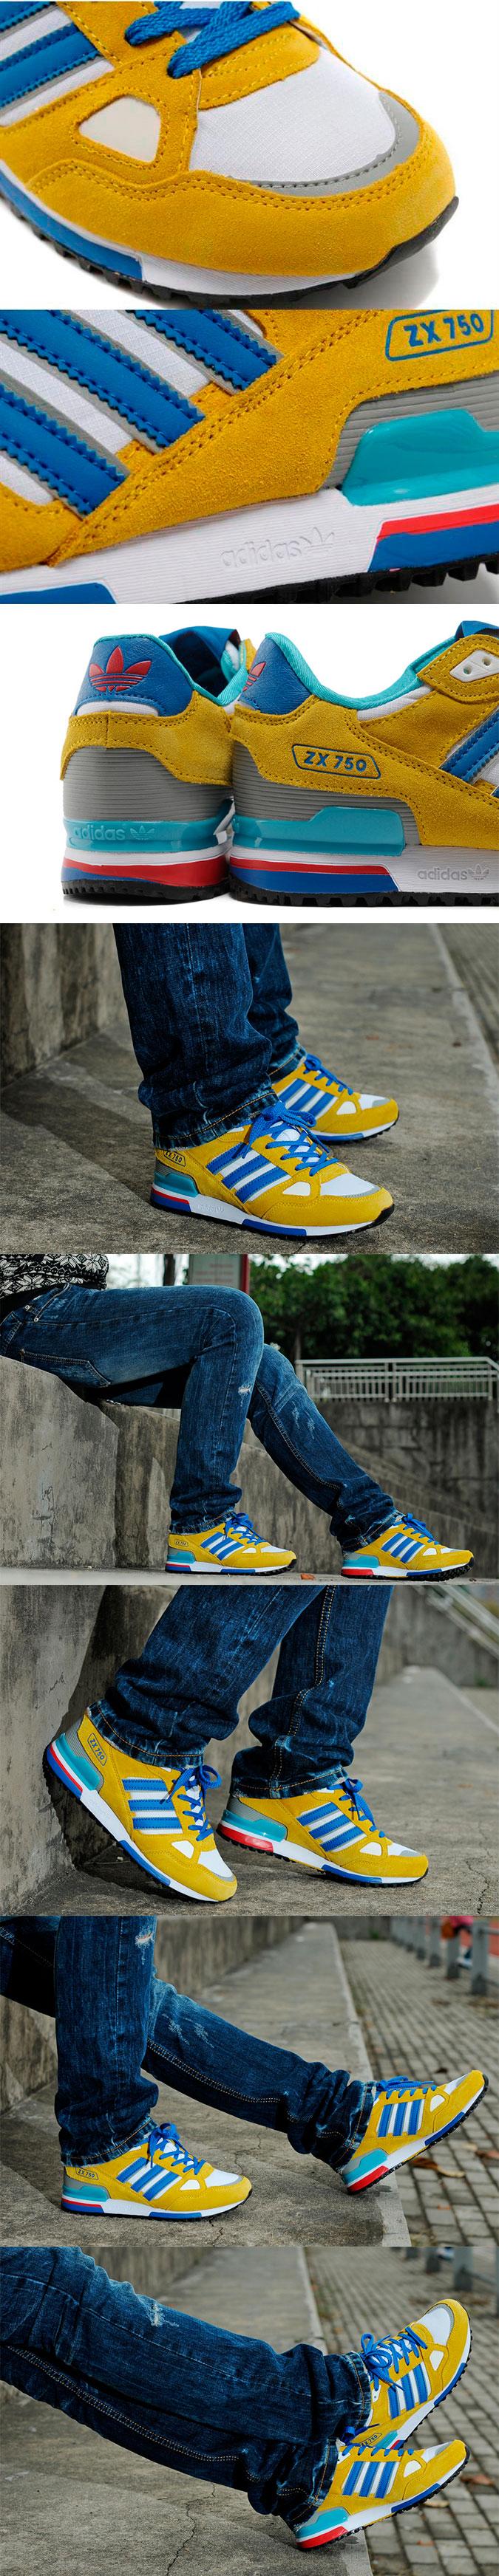 большое фото №6 Adidas zx750 G64039